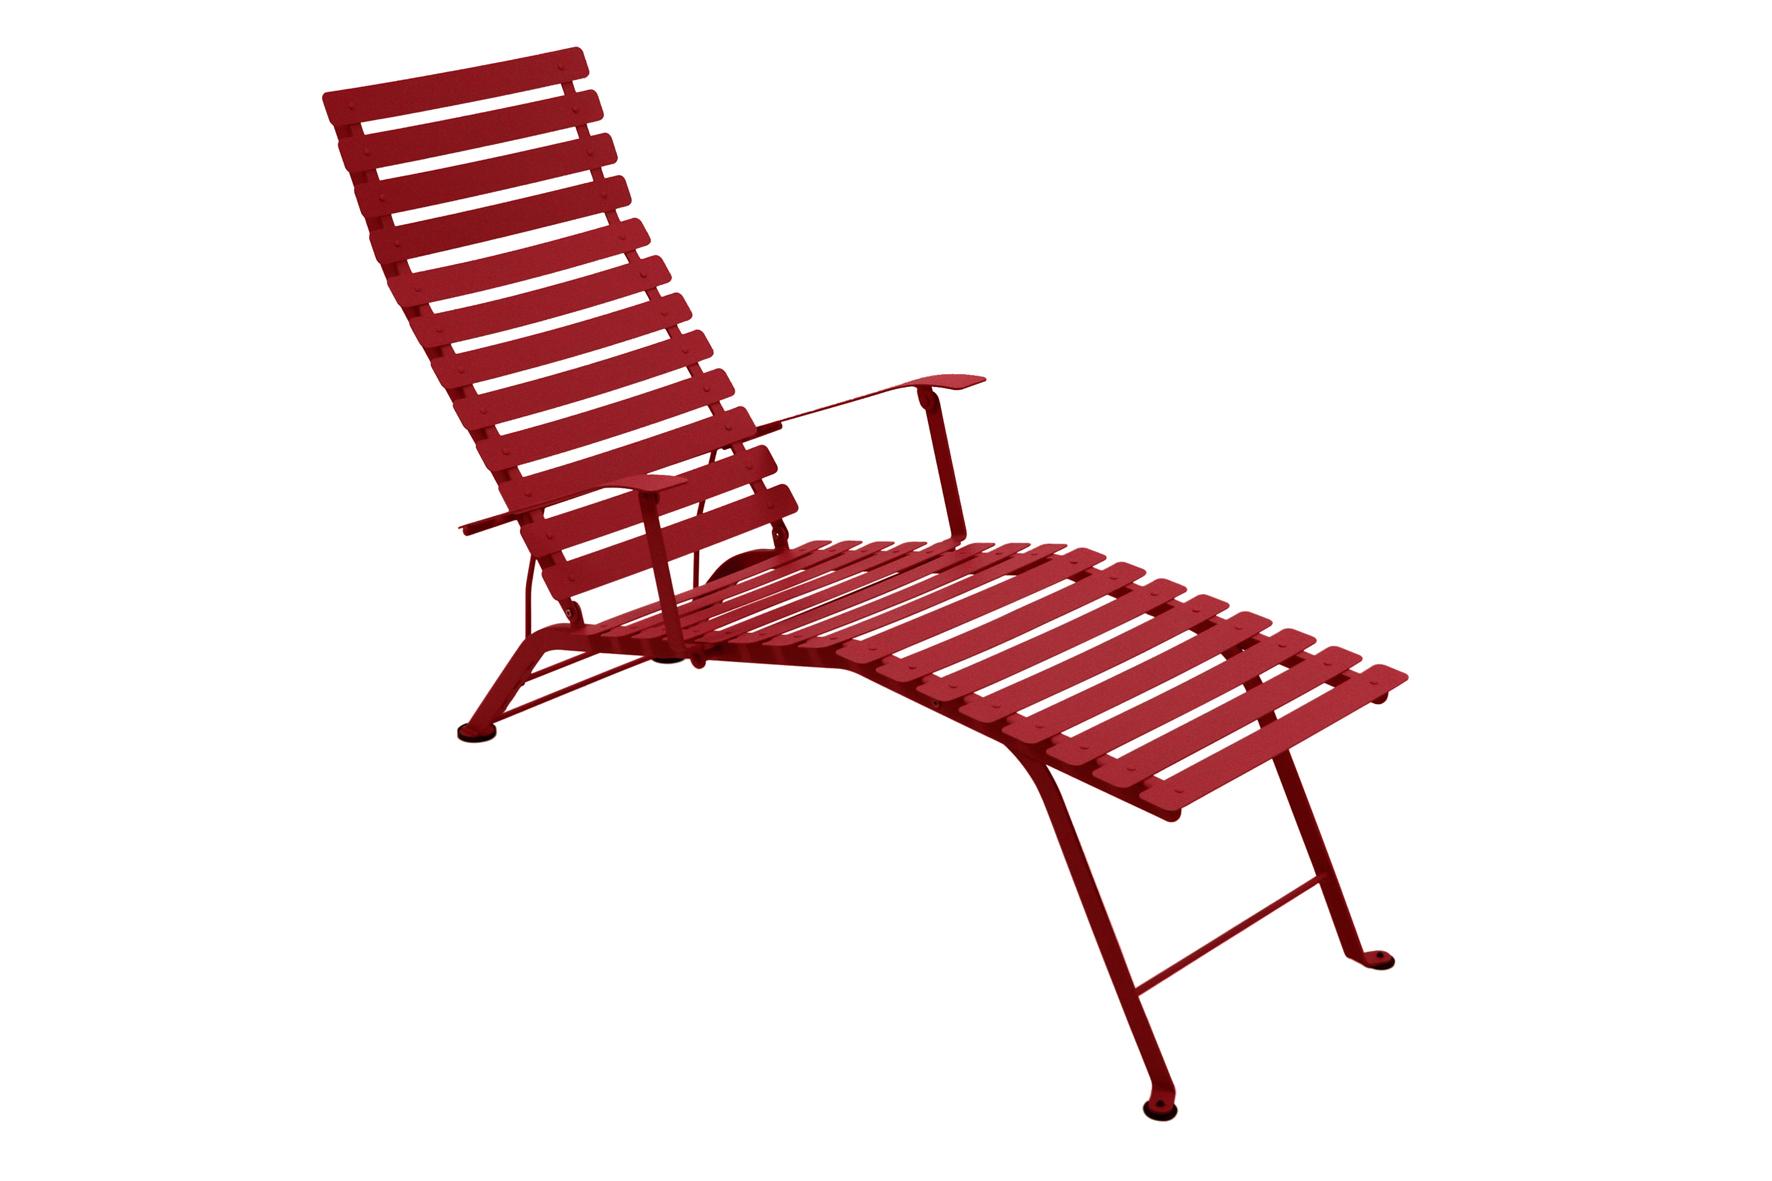 Bistro chaise longue-160143